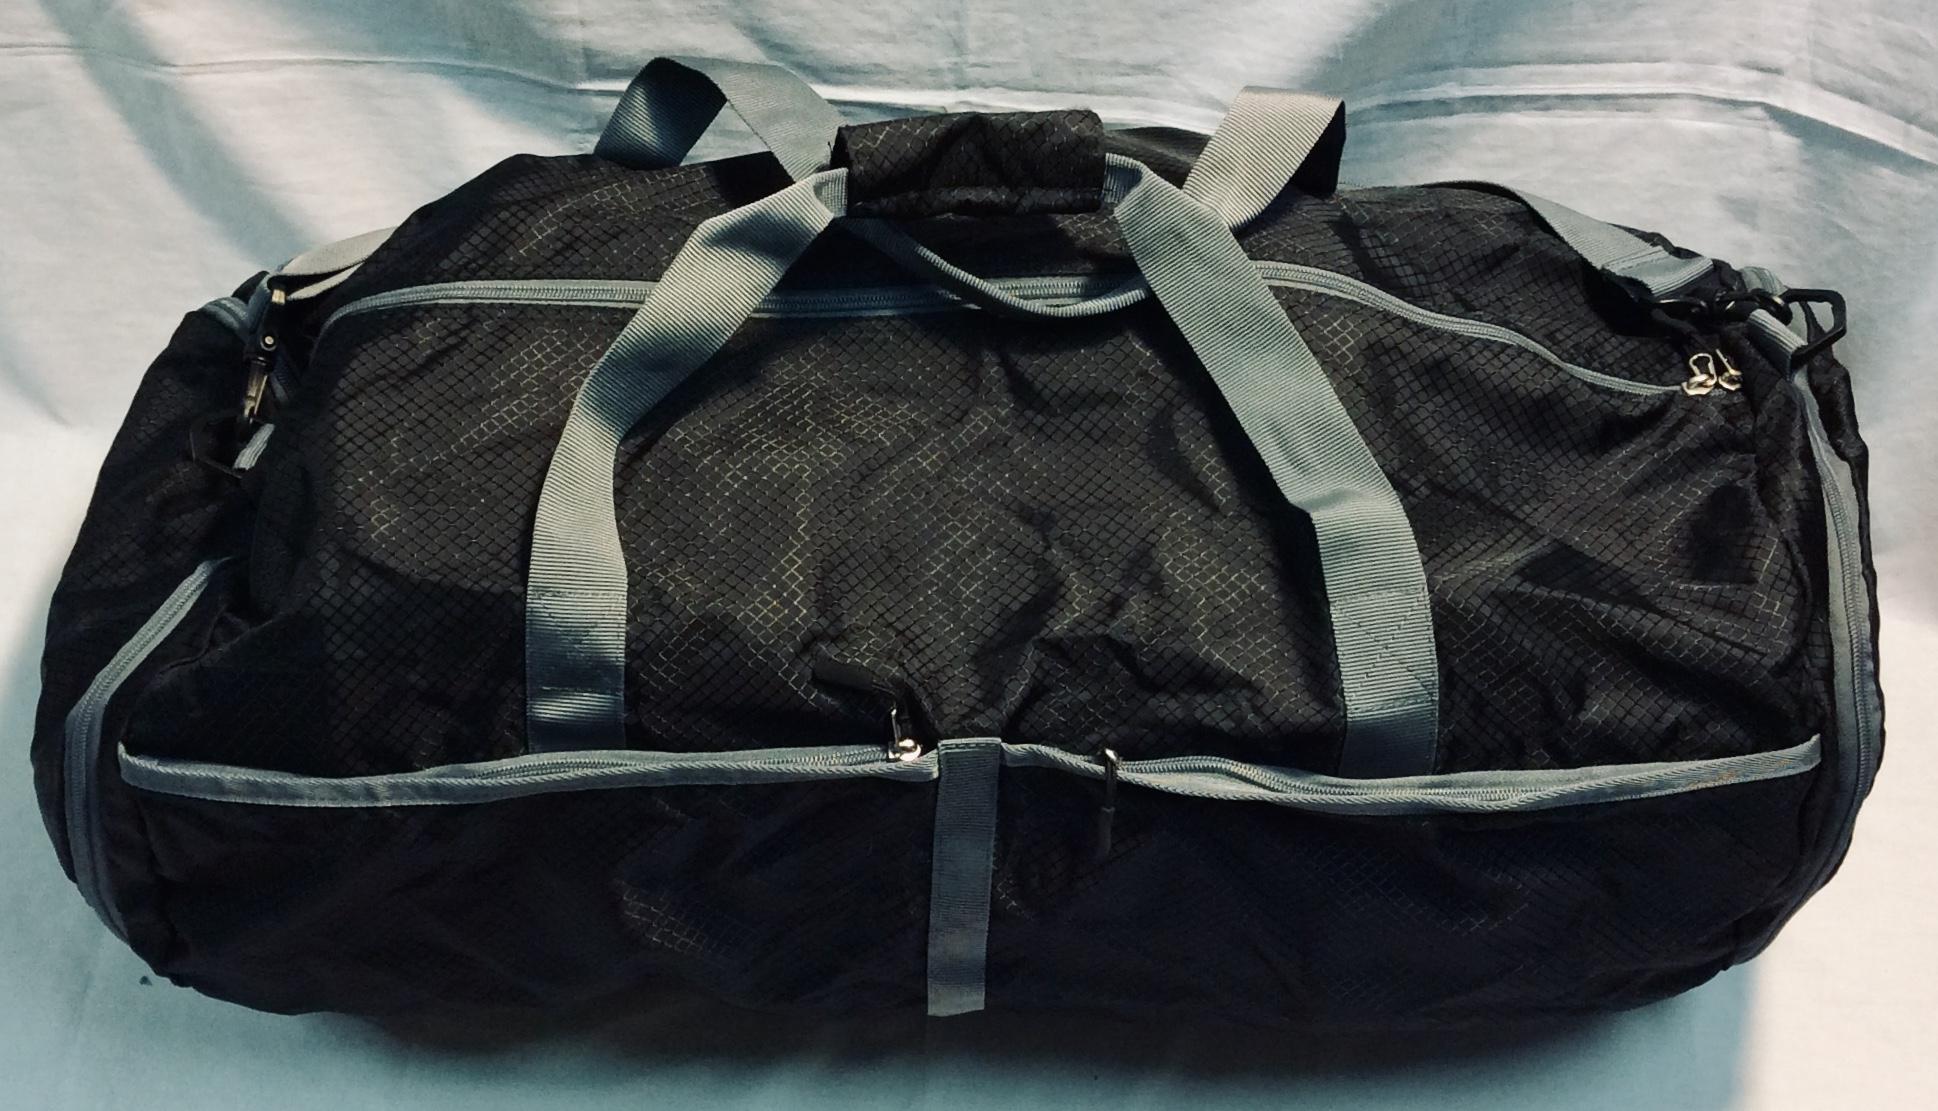 Amazonbasics Black Nylon Duffle Bag